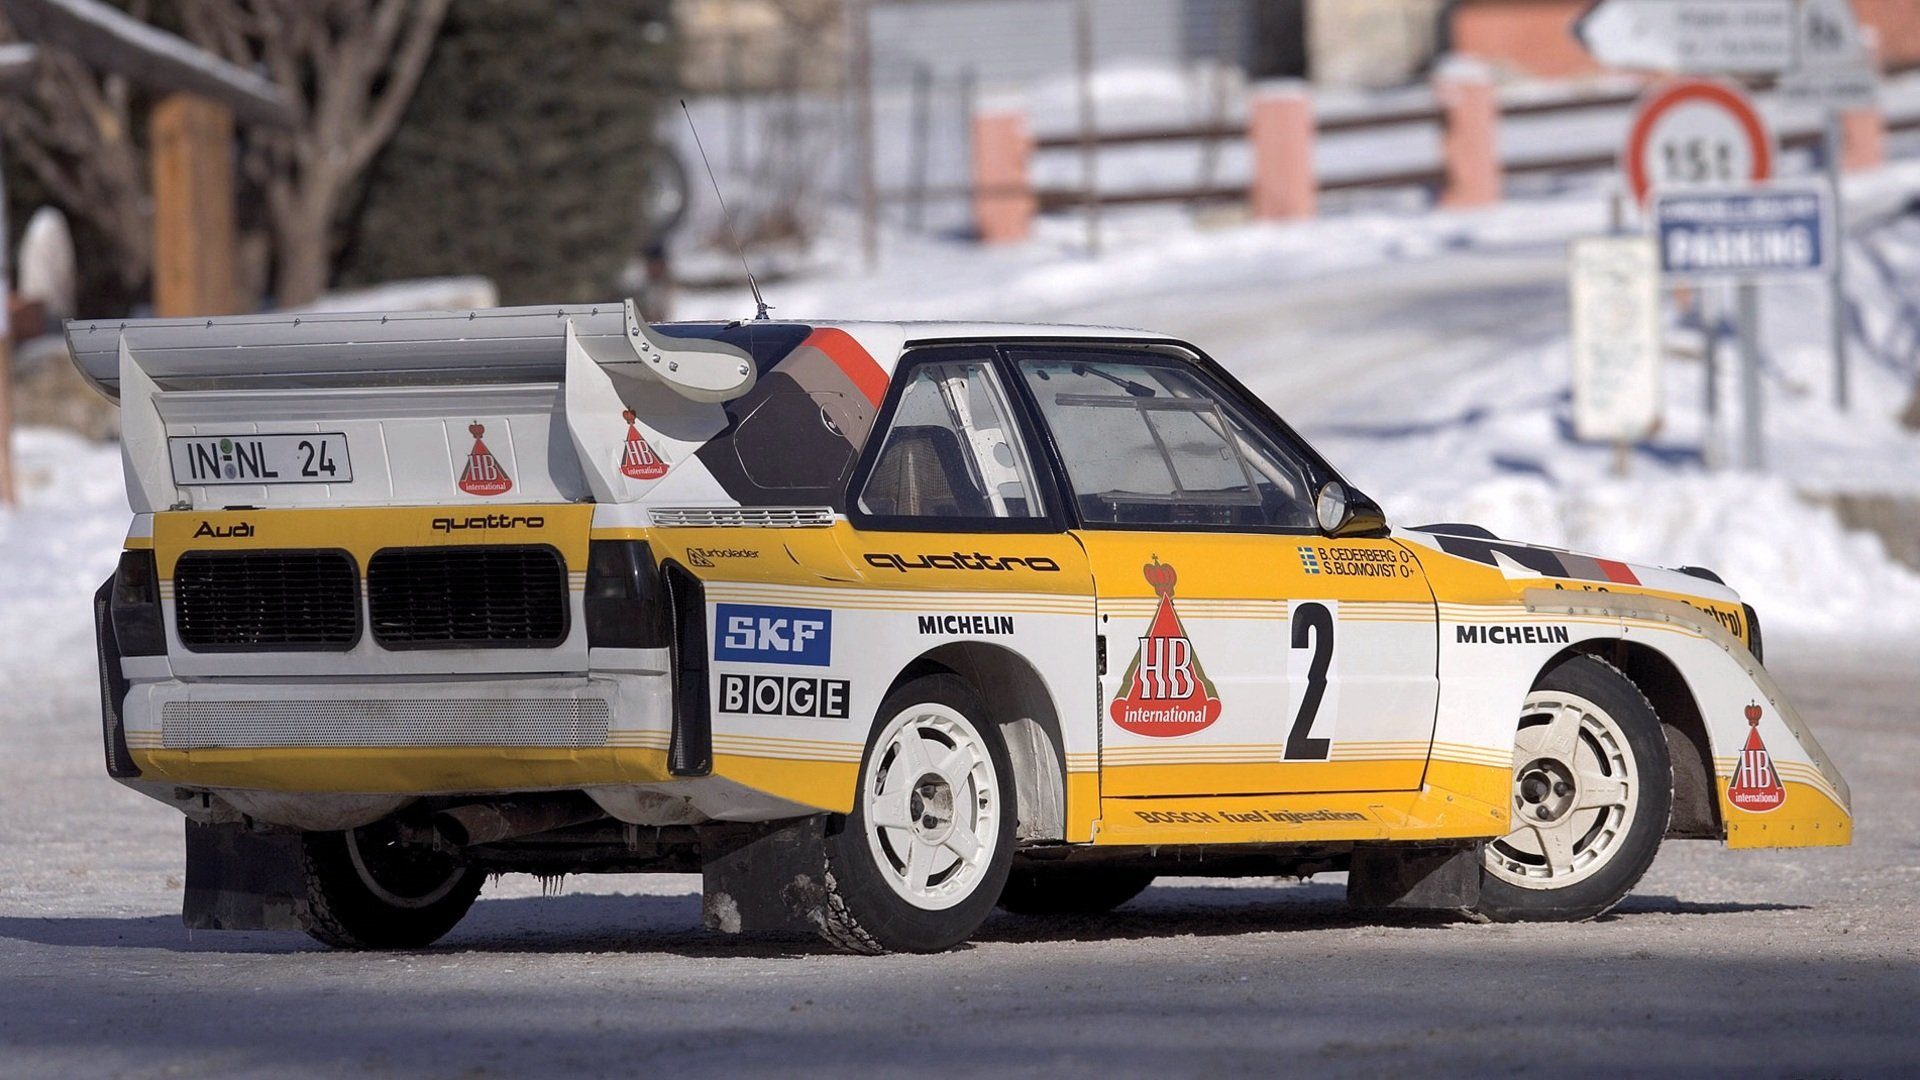 Audi A1 rally group B car vehicle quattro wallpaper background 1920x1080